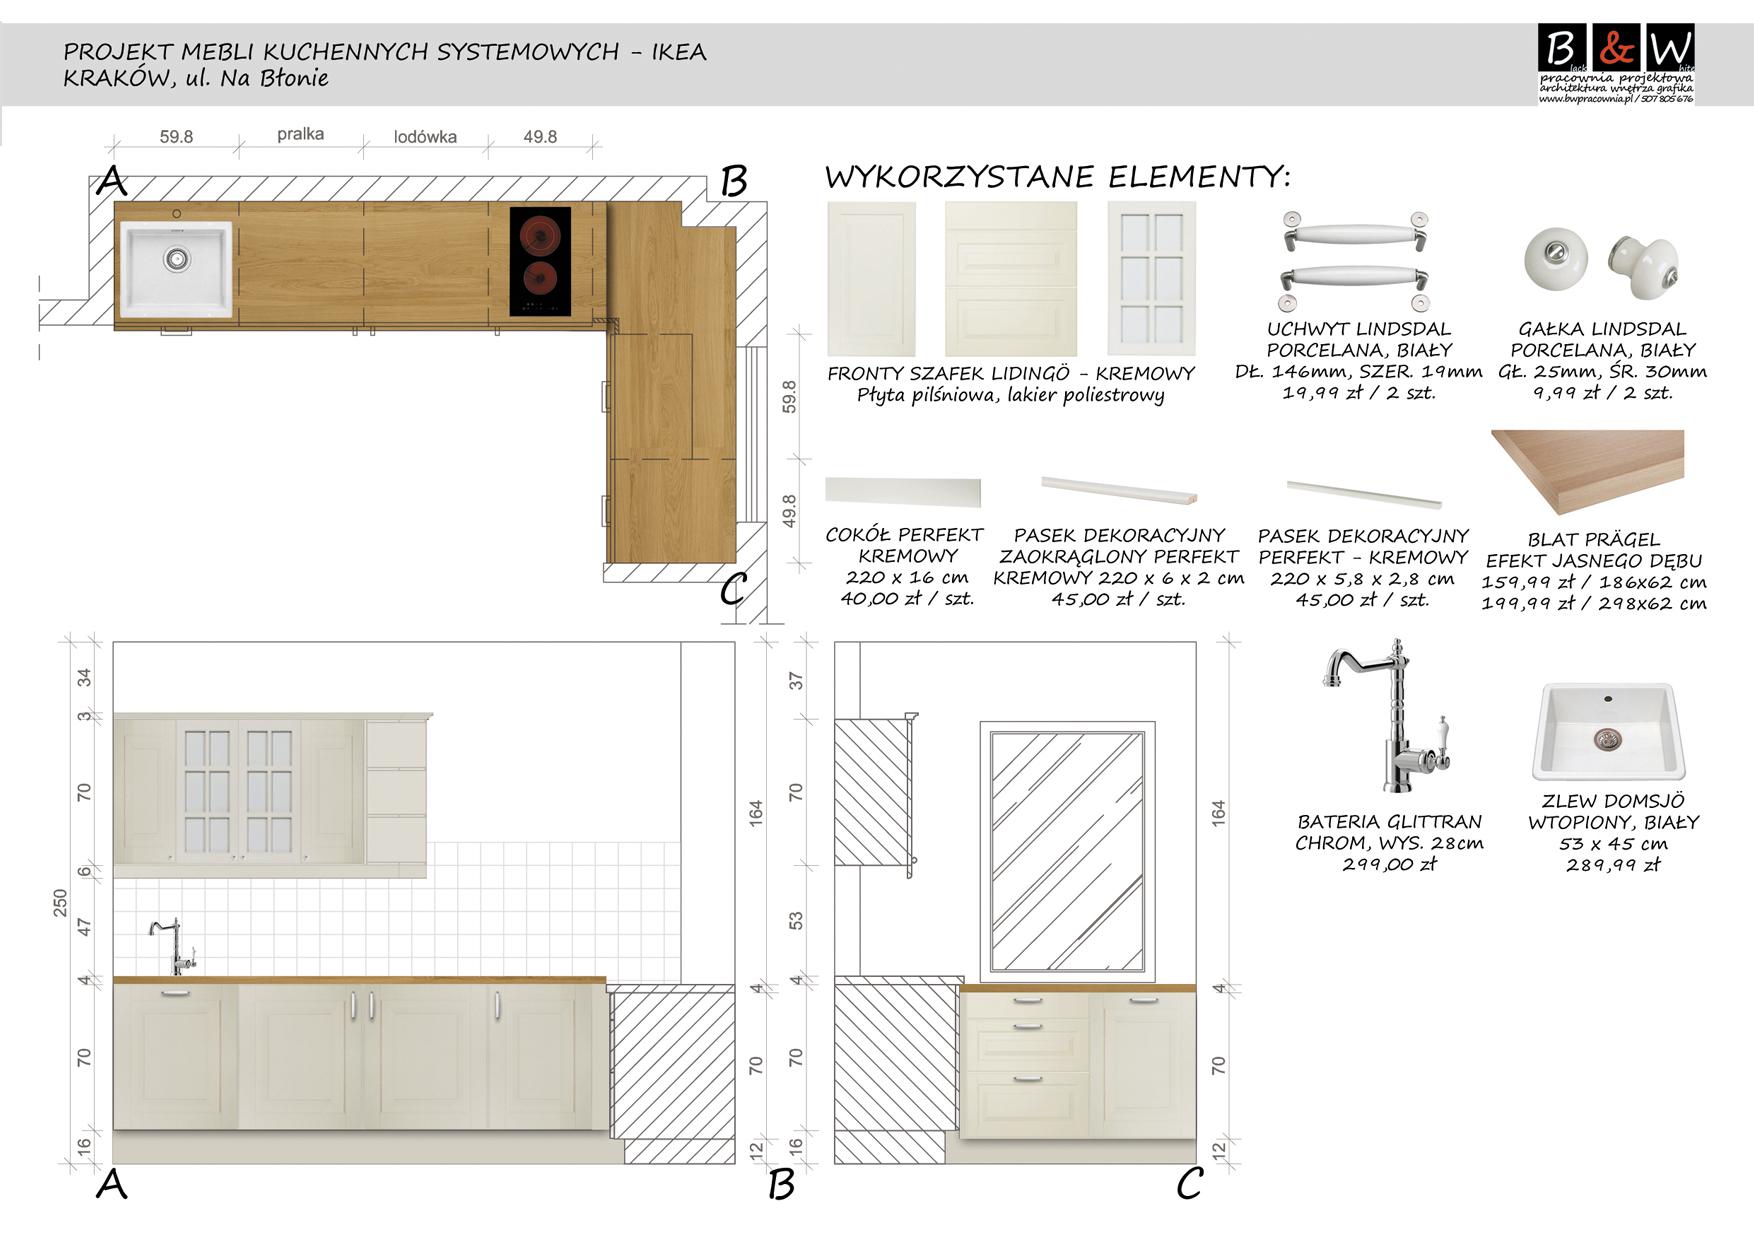 projektowanie kuchni i mebli ikea krak243w oferta nr 76004